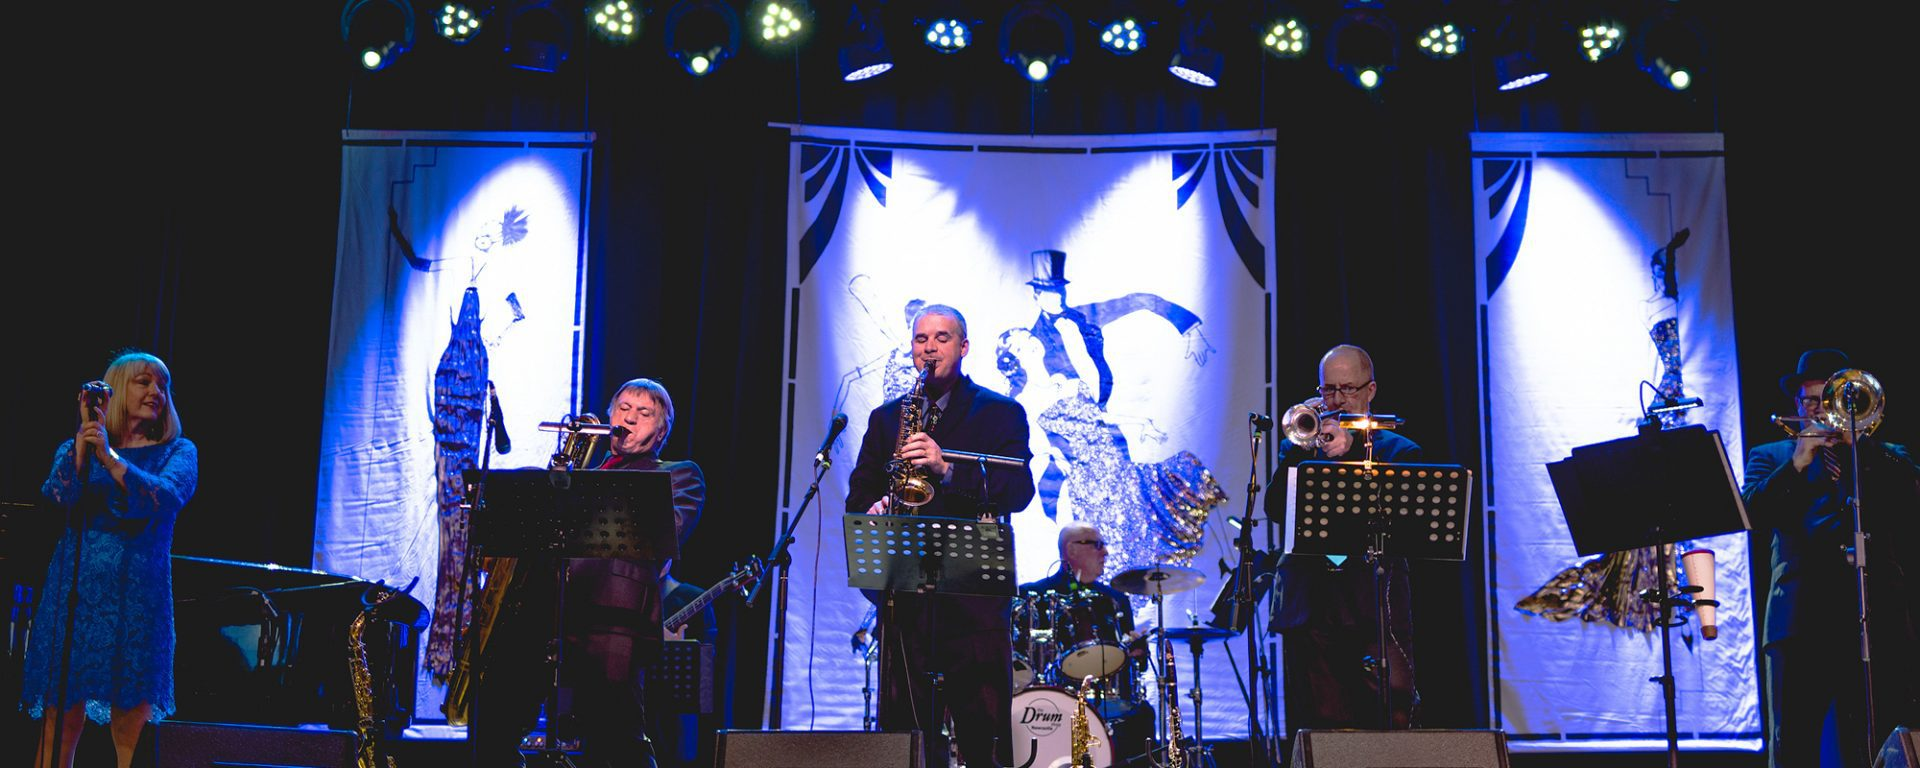 Nova Swing Band | Hot, Cool & Swingin' | Andy Firth Music